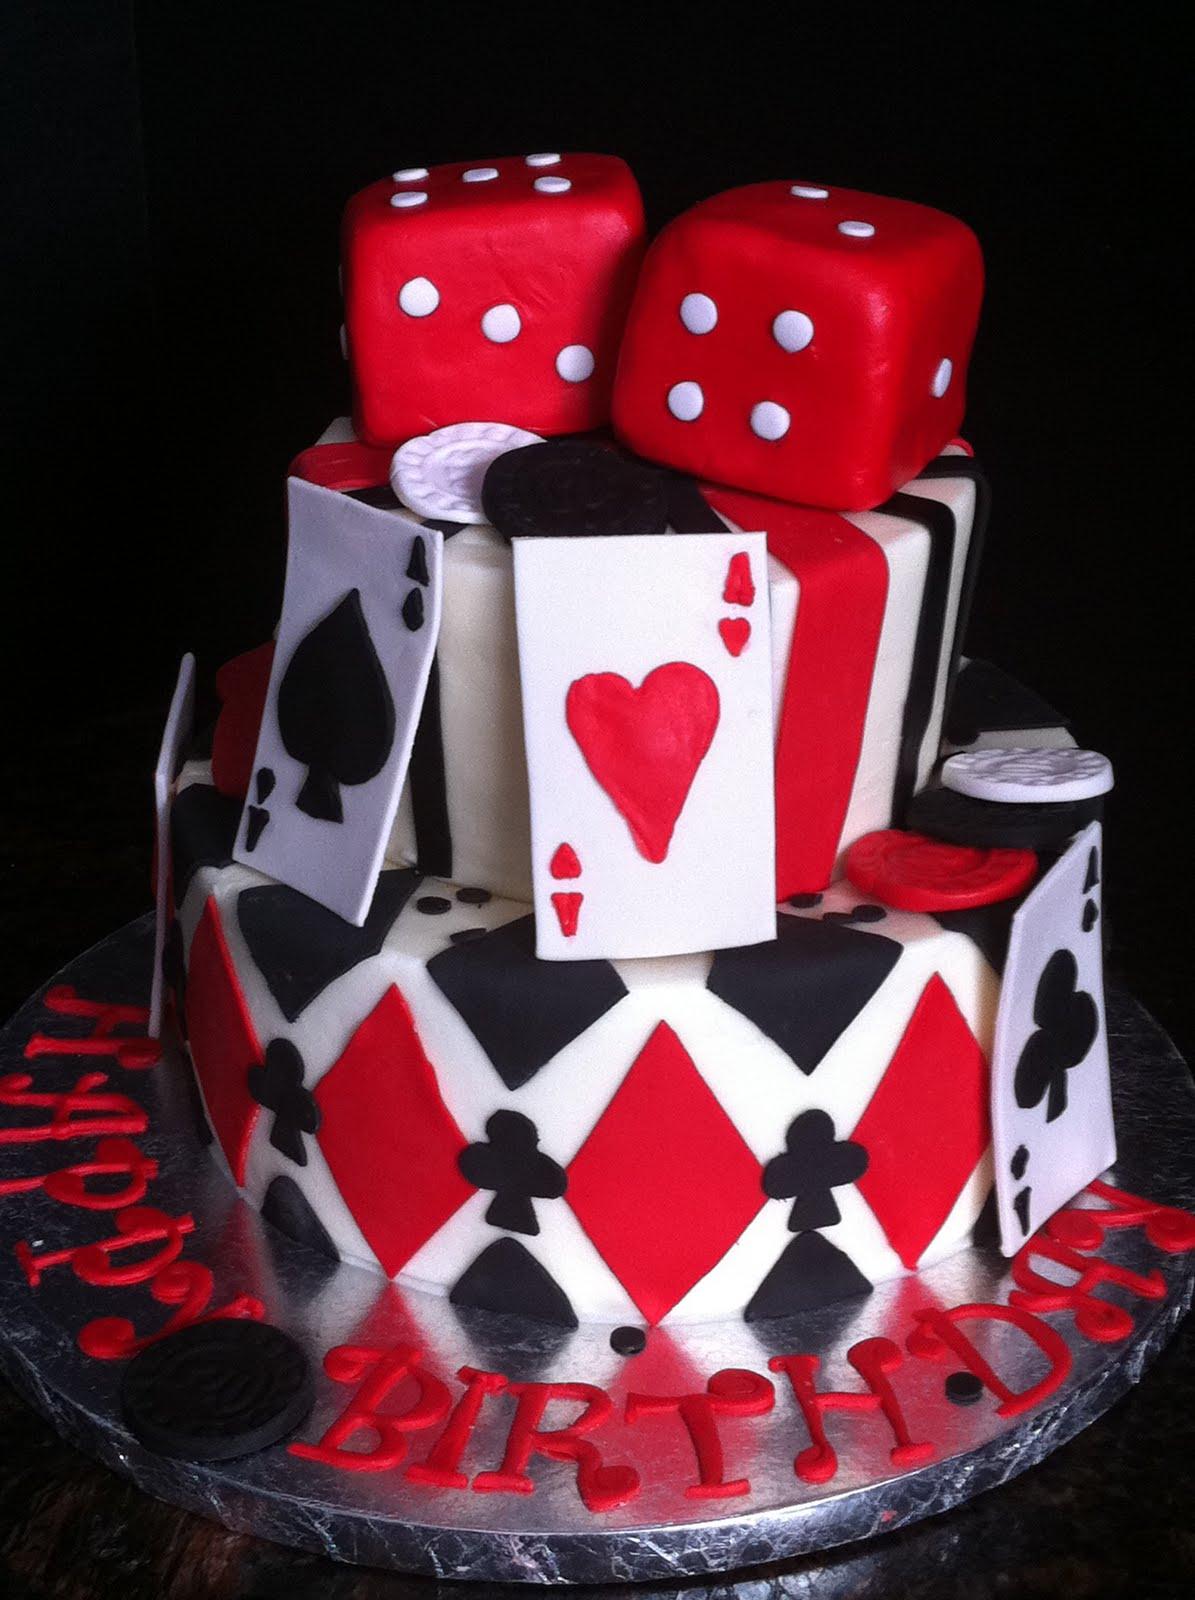 Casino Cake My Sweet Zepol